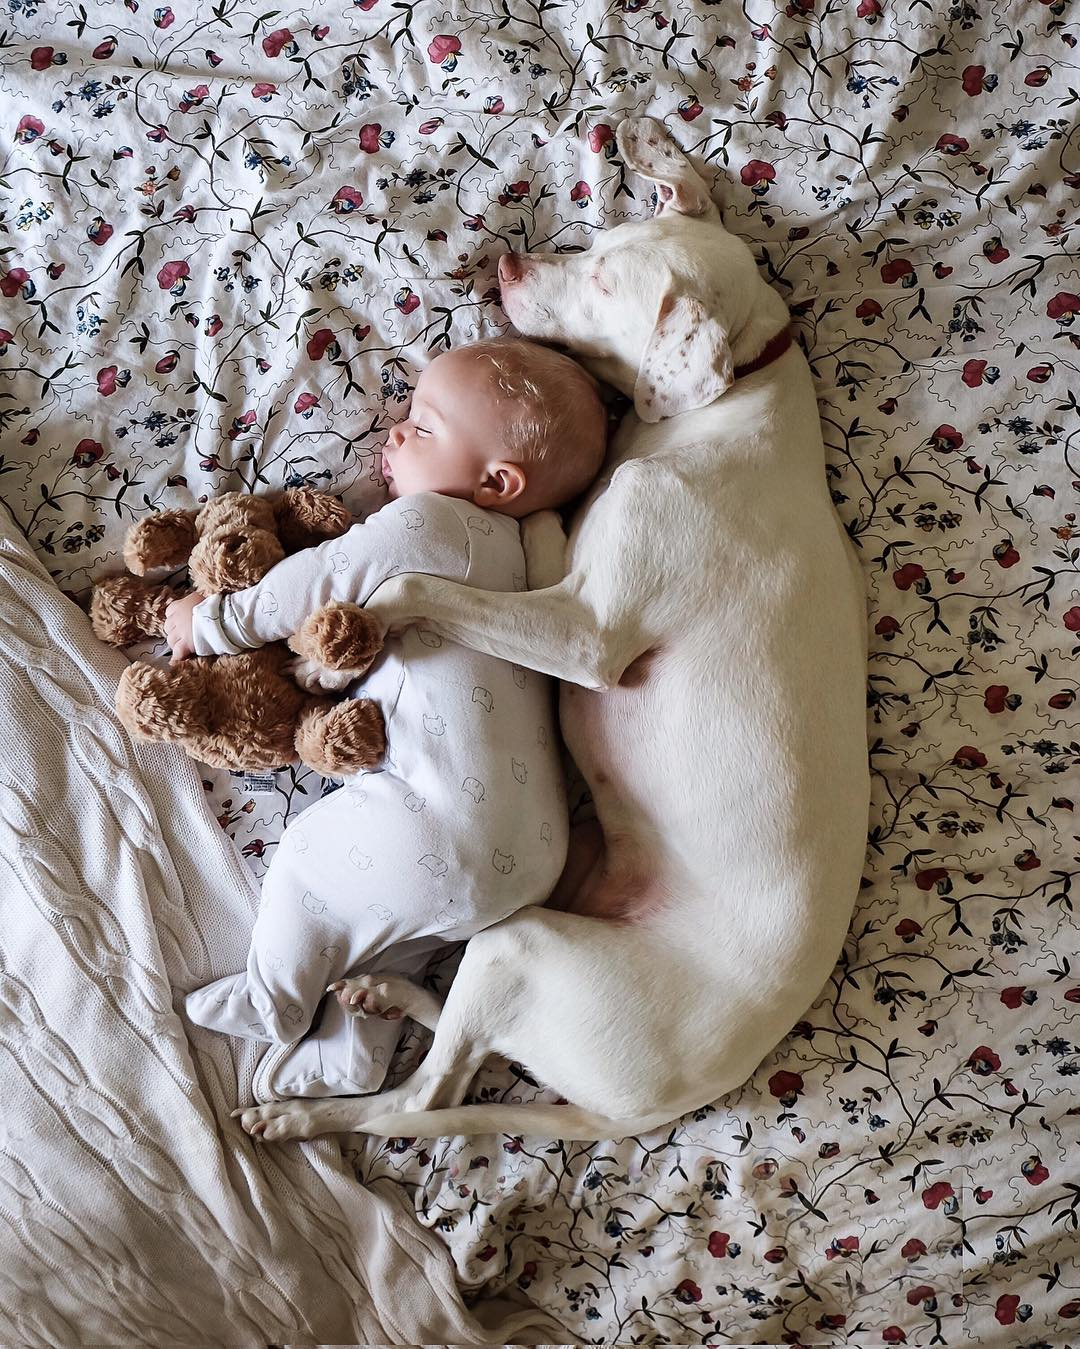 cane dorme con la bambina8